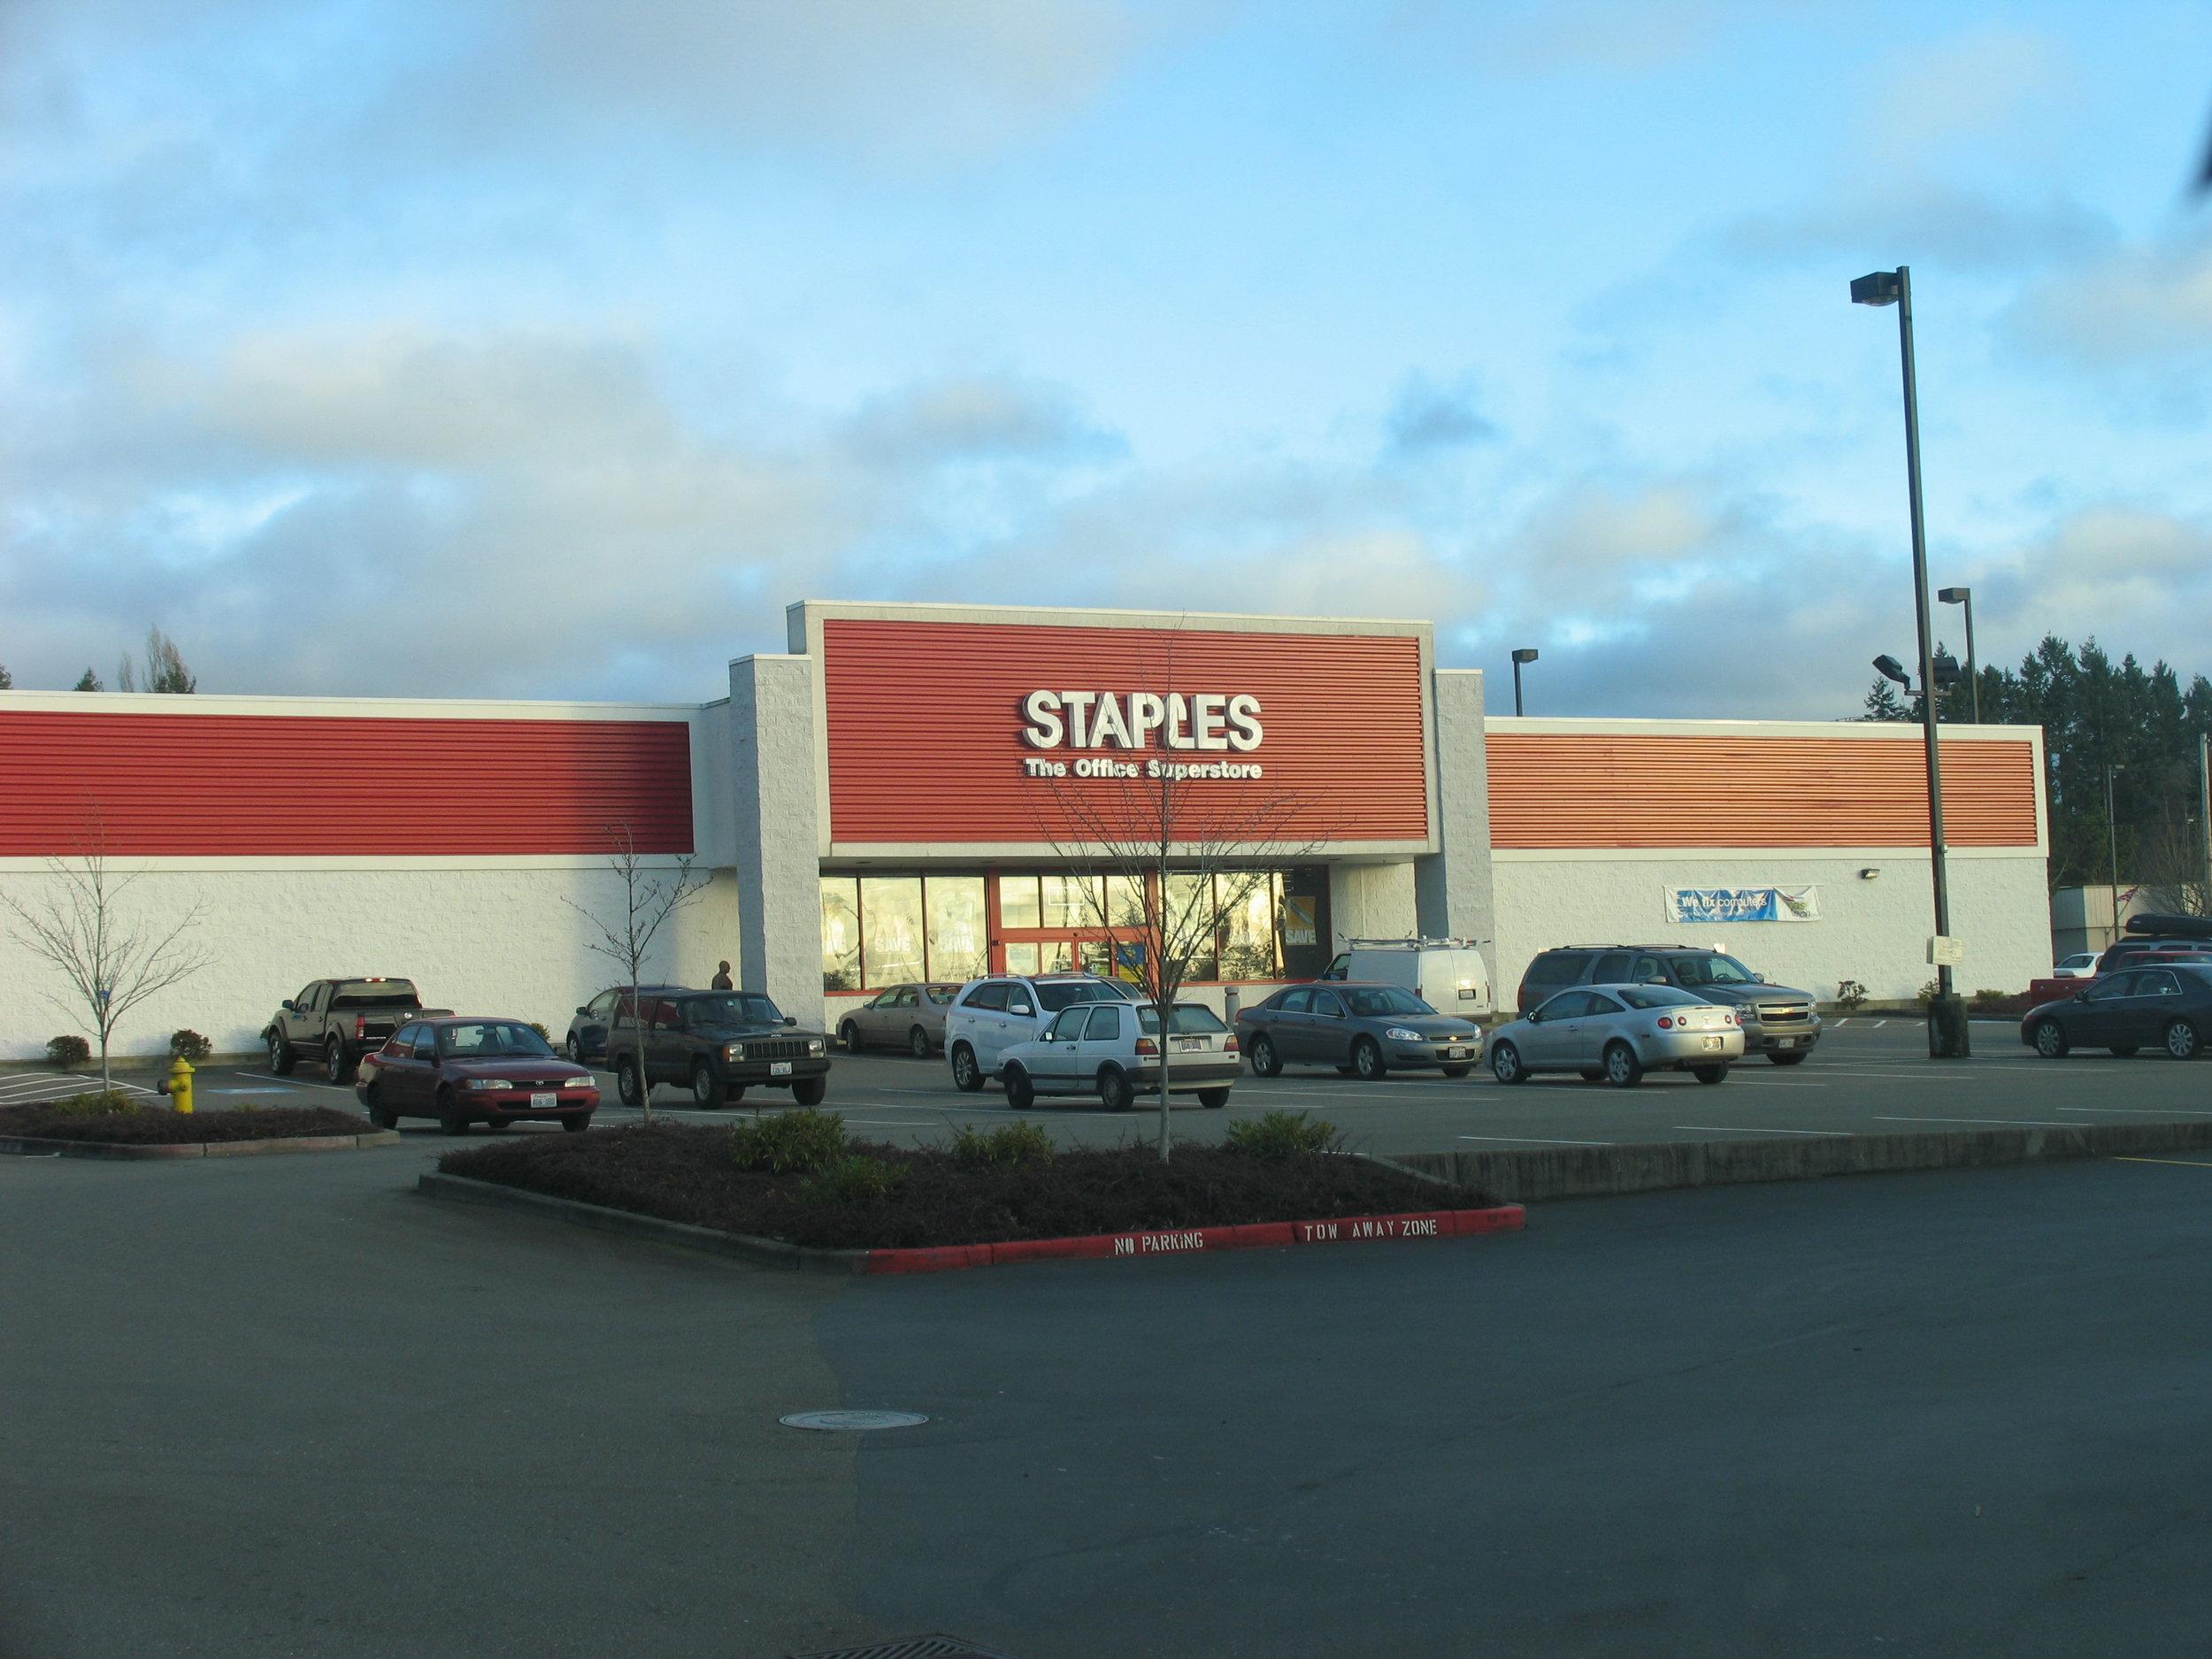 Staples - Lund Avenue, Port Orchard, WA.JPG